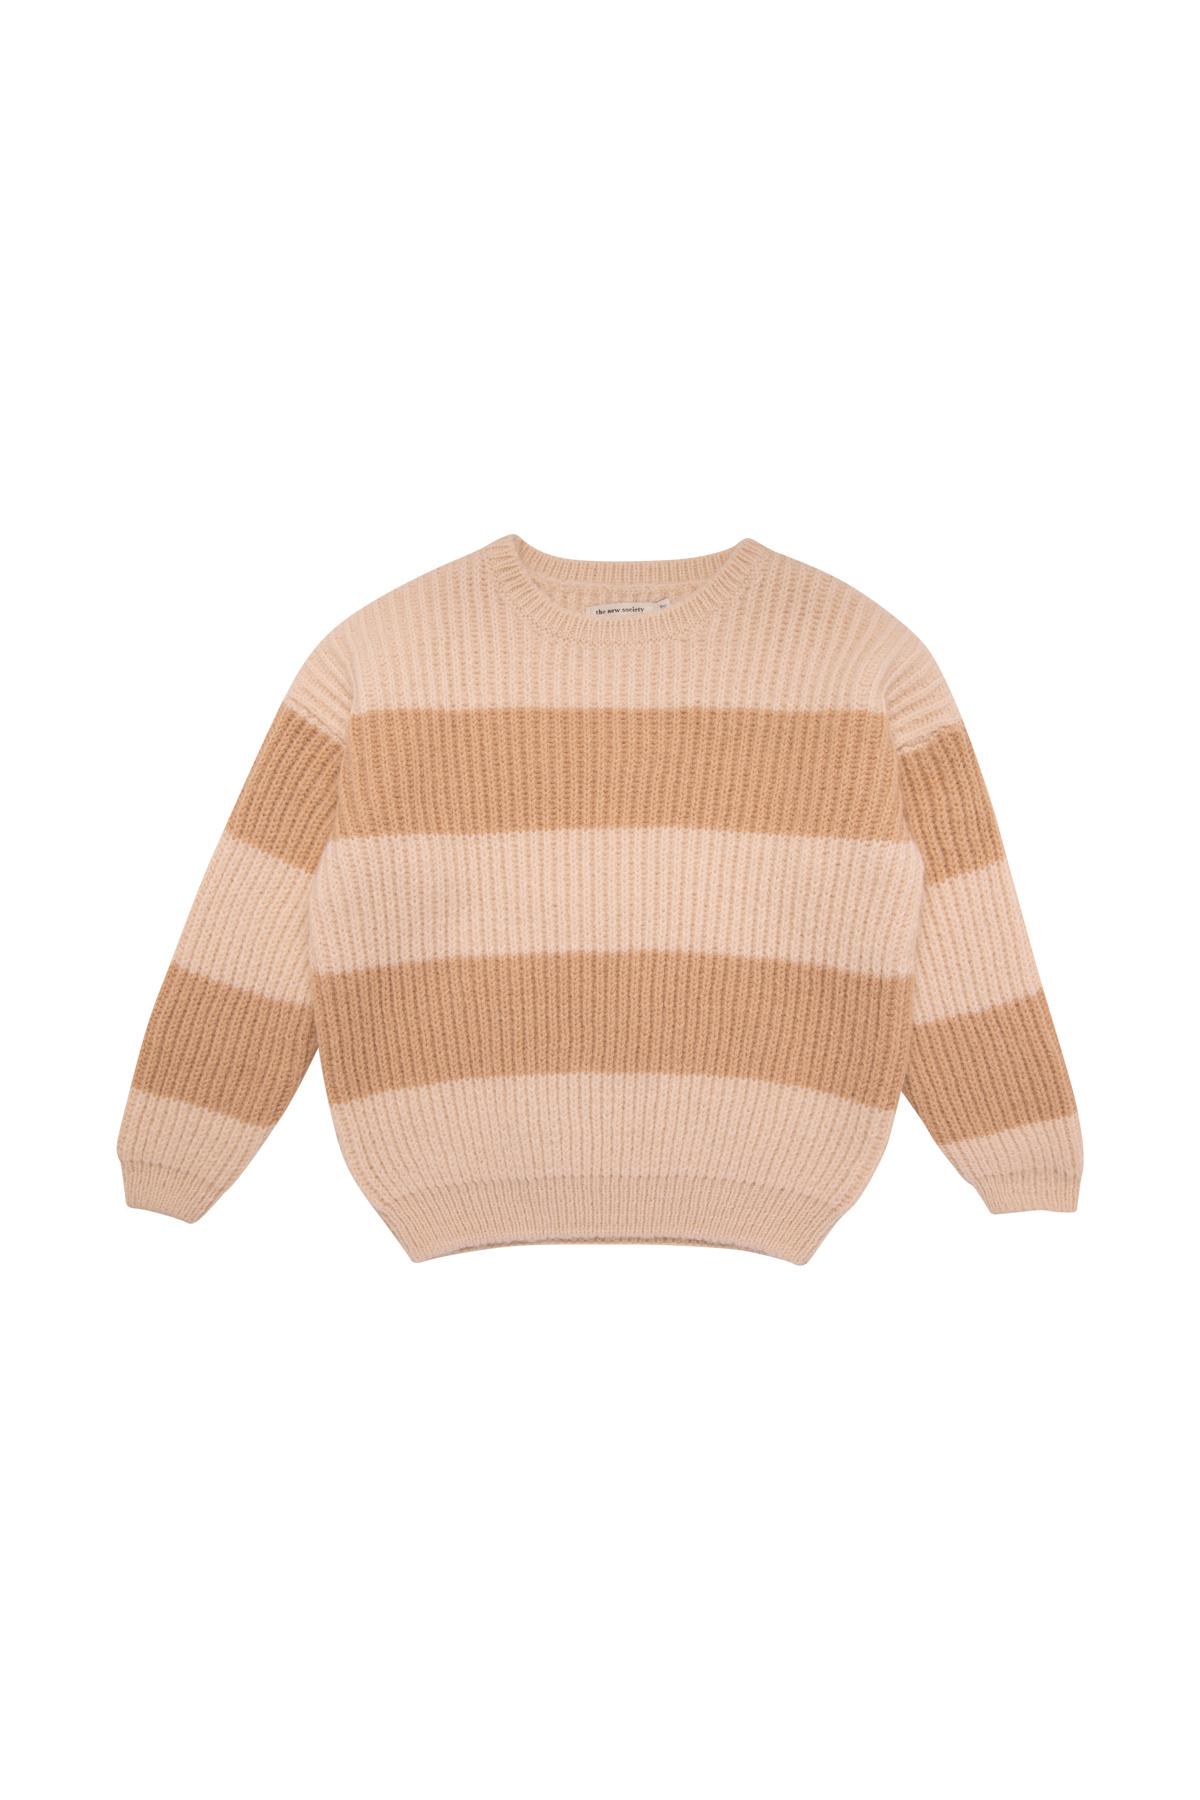 Ian sweater - Blush-1